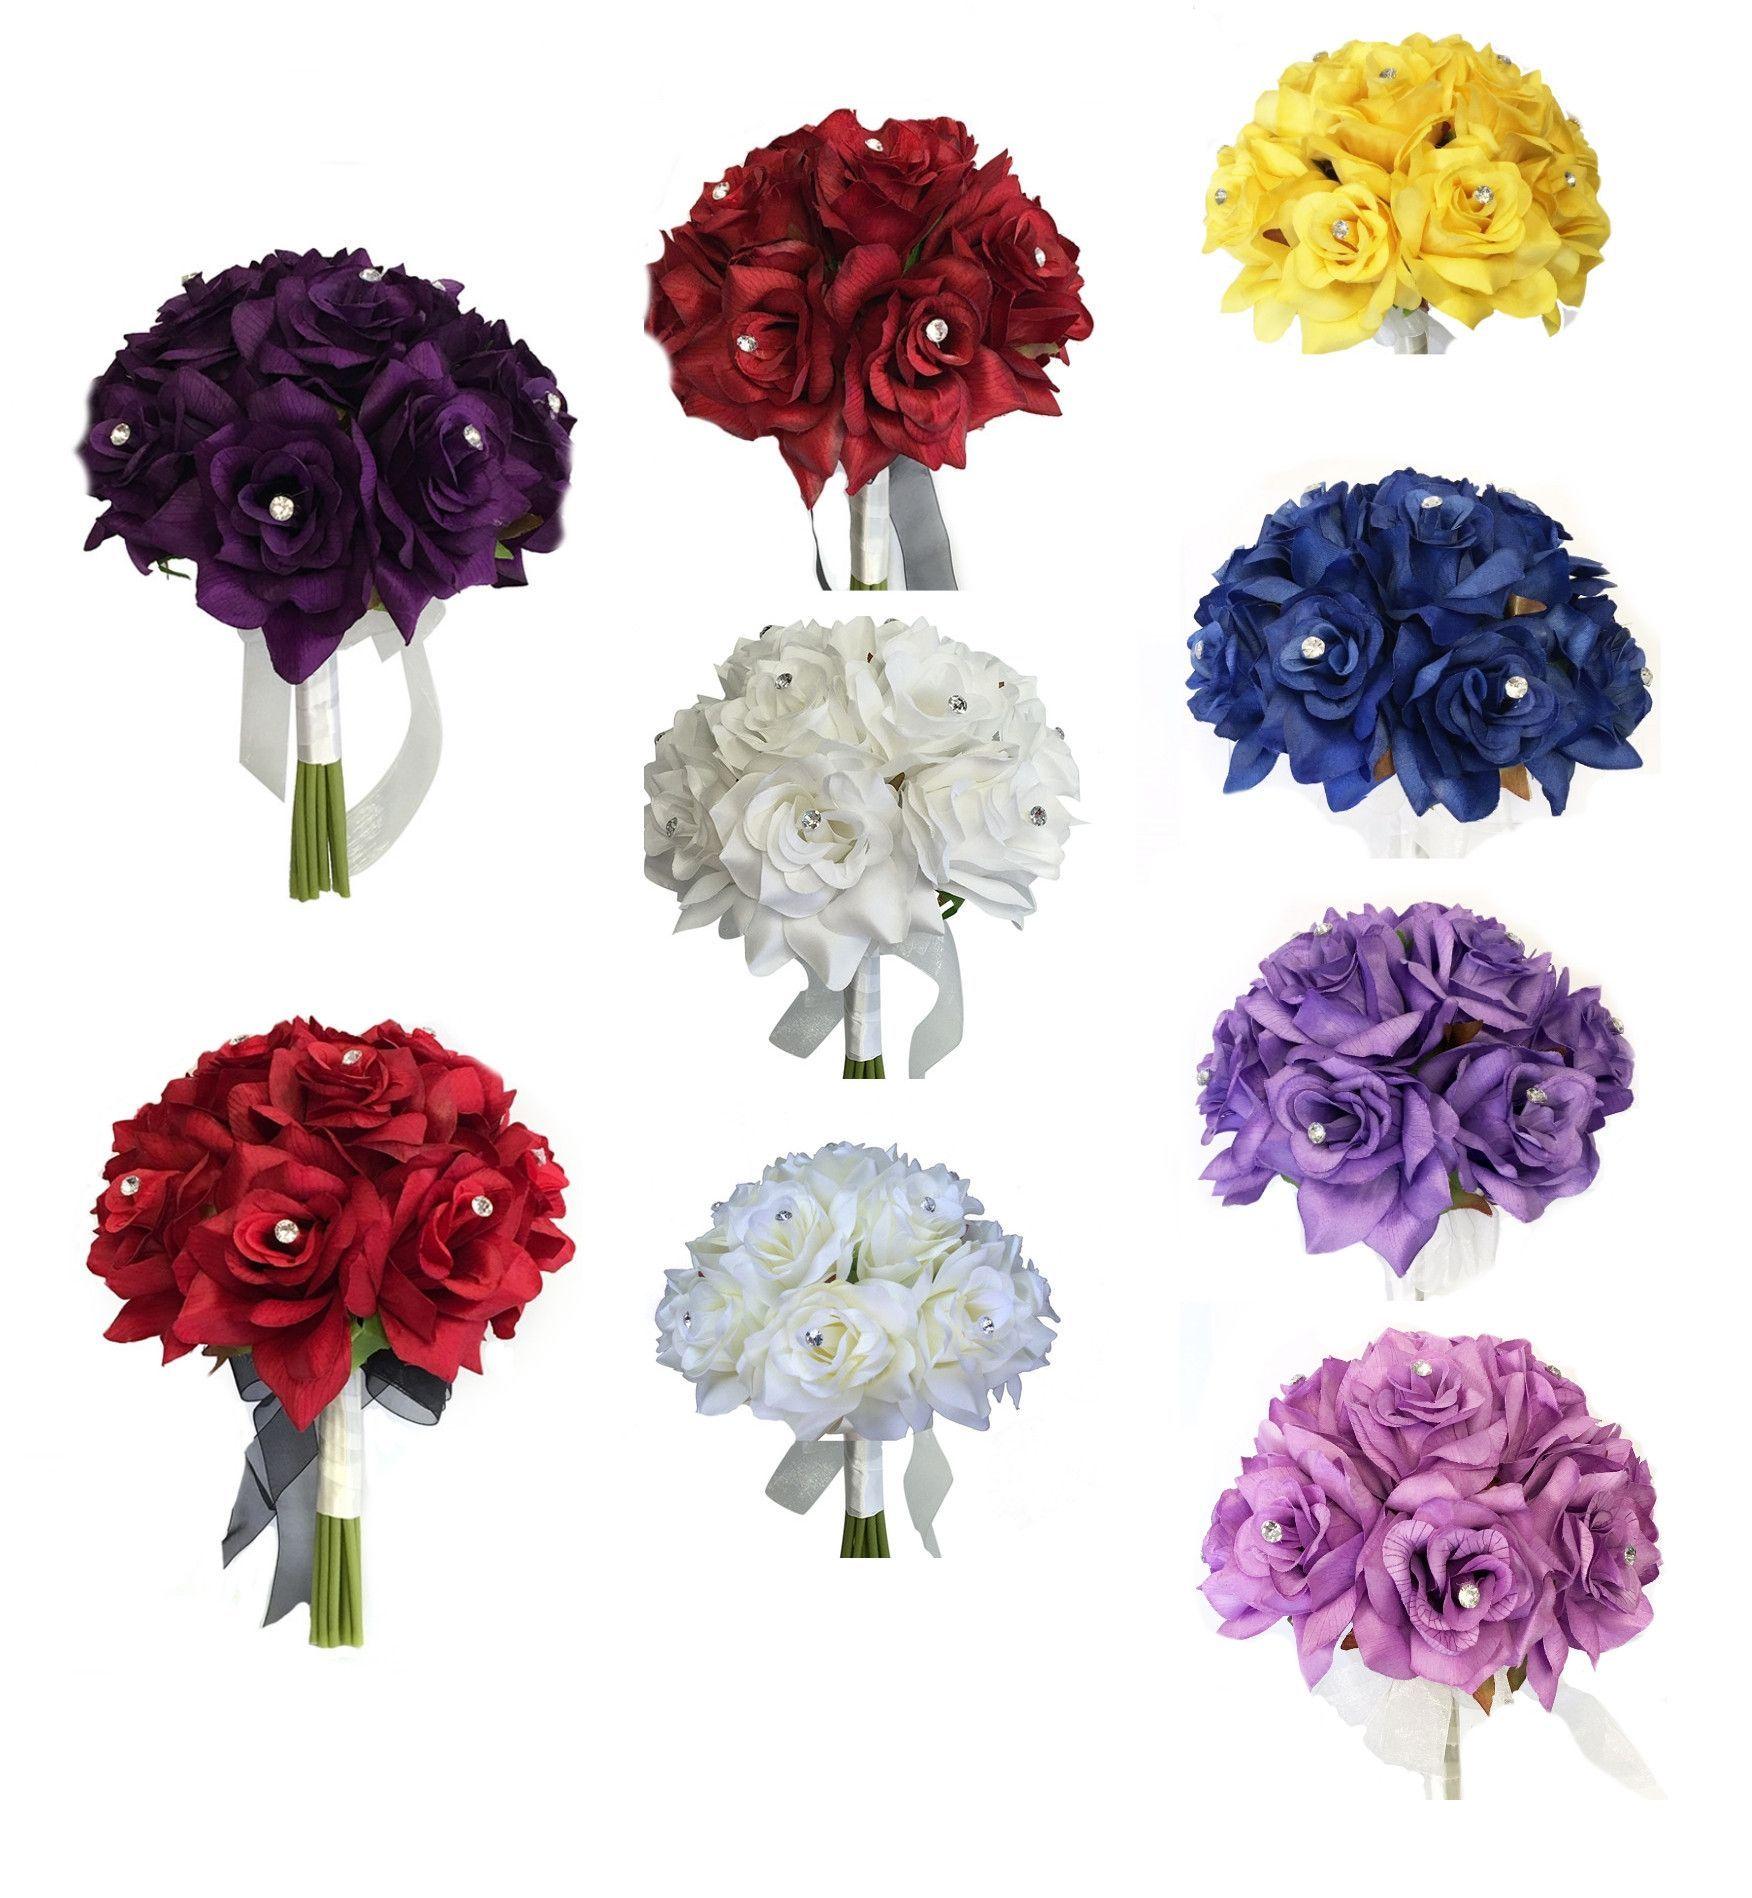 1 Dozen Rose bouquet-Roses with Rhinestones-Pick rose colors